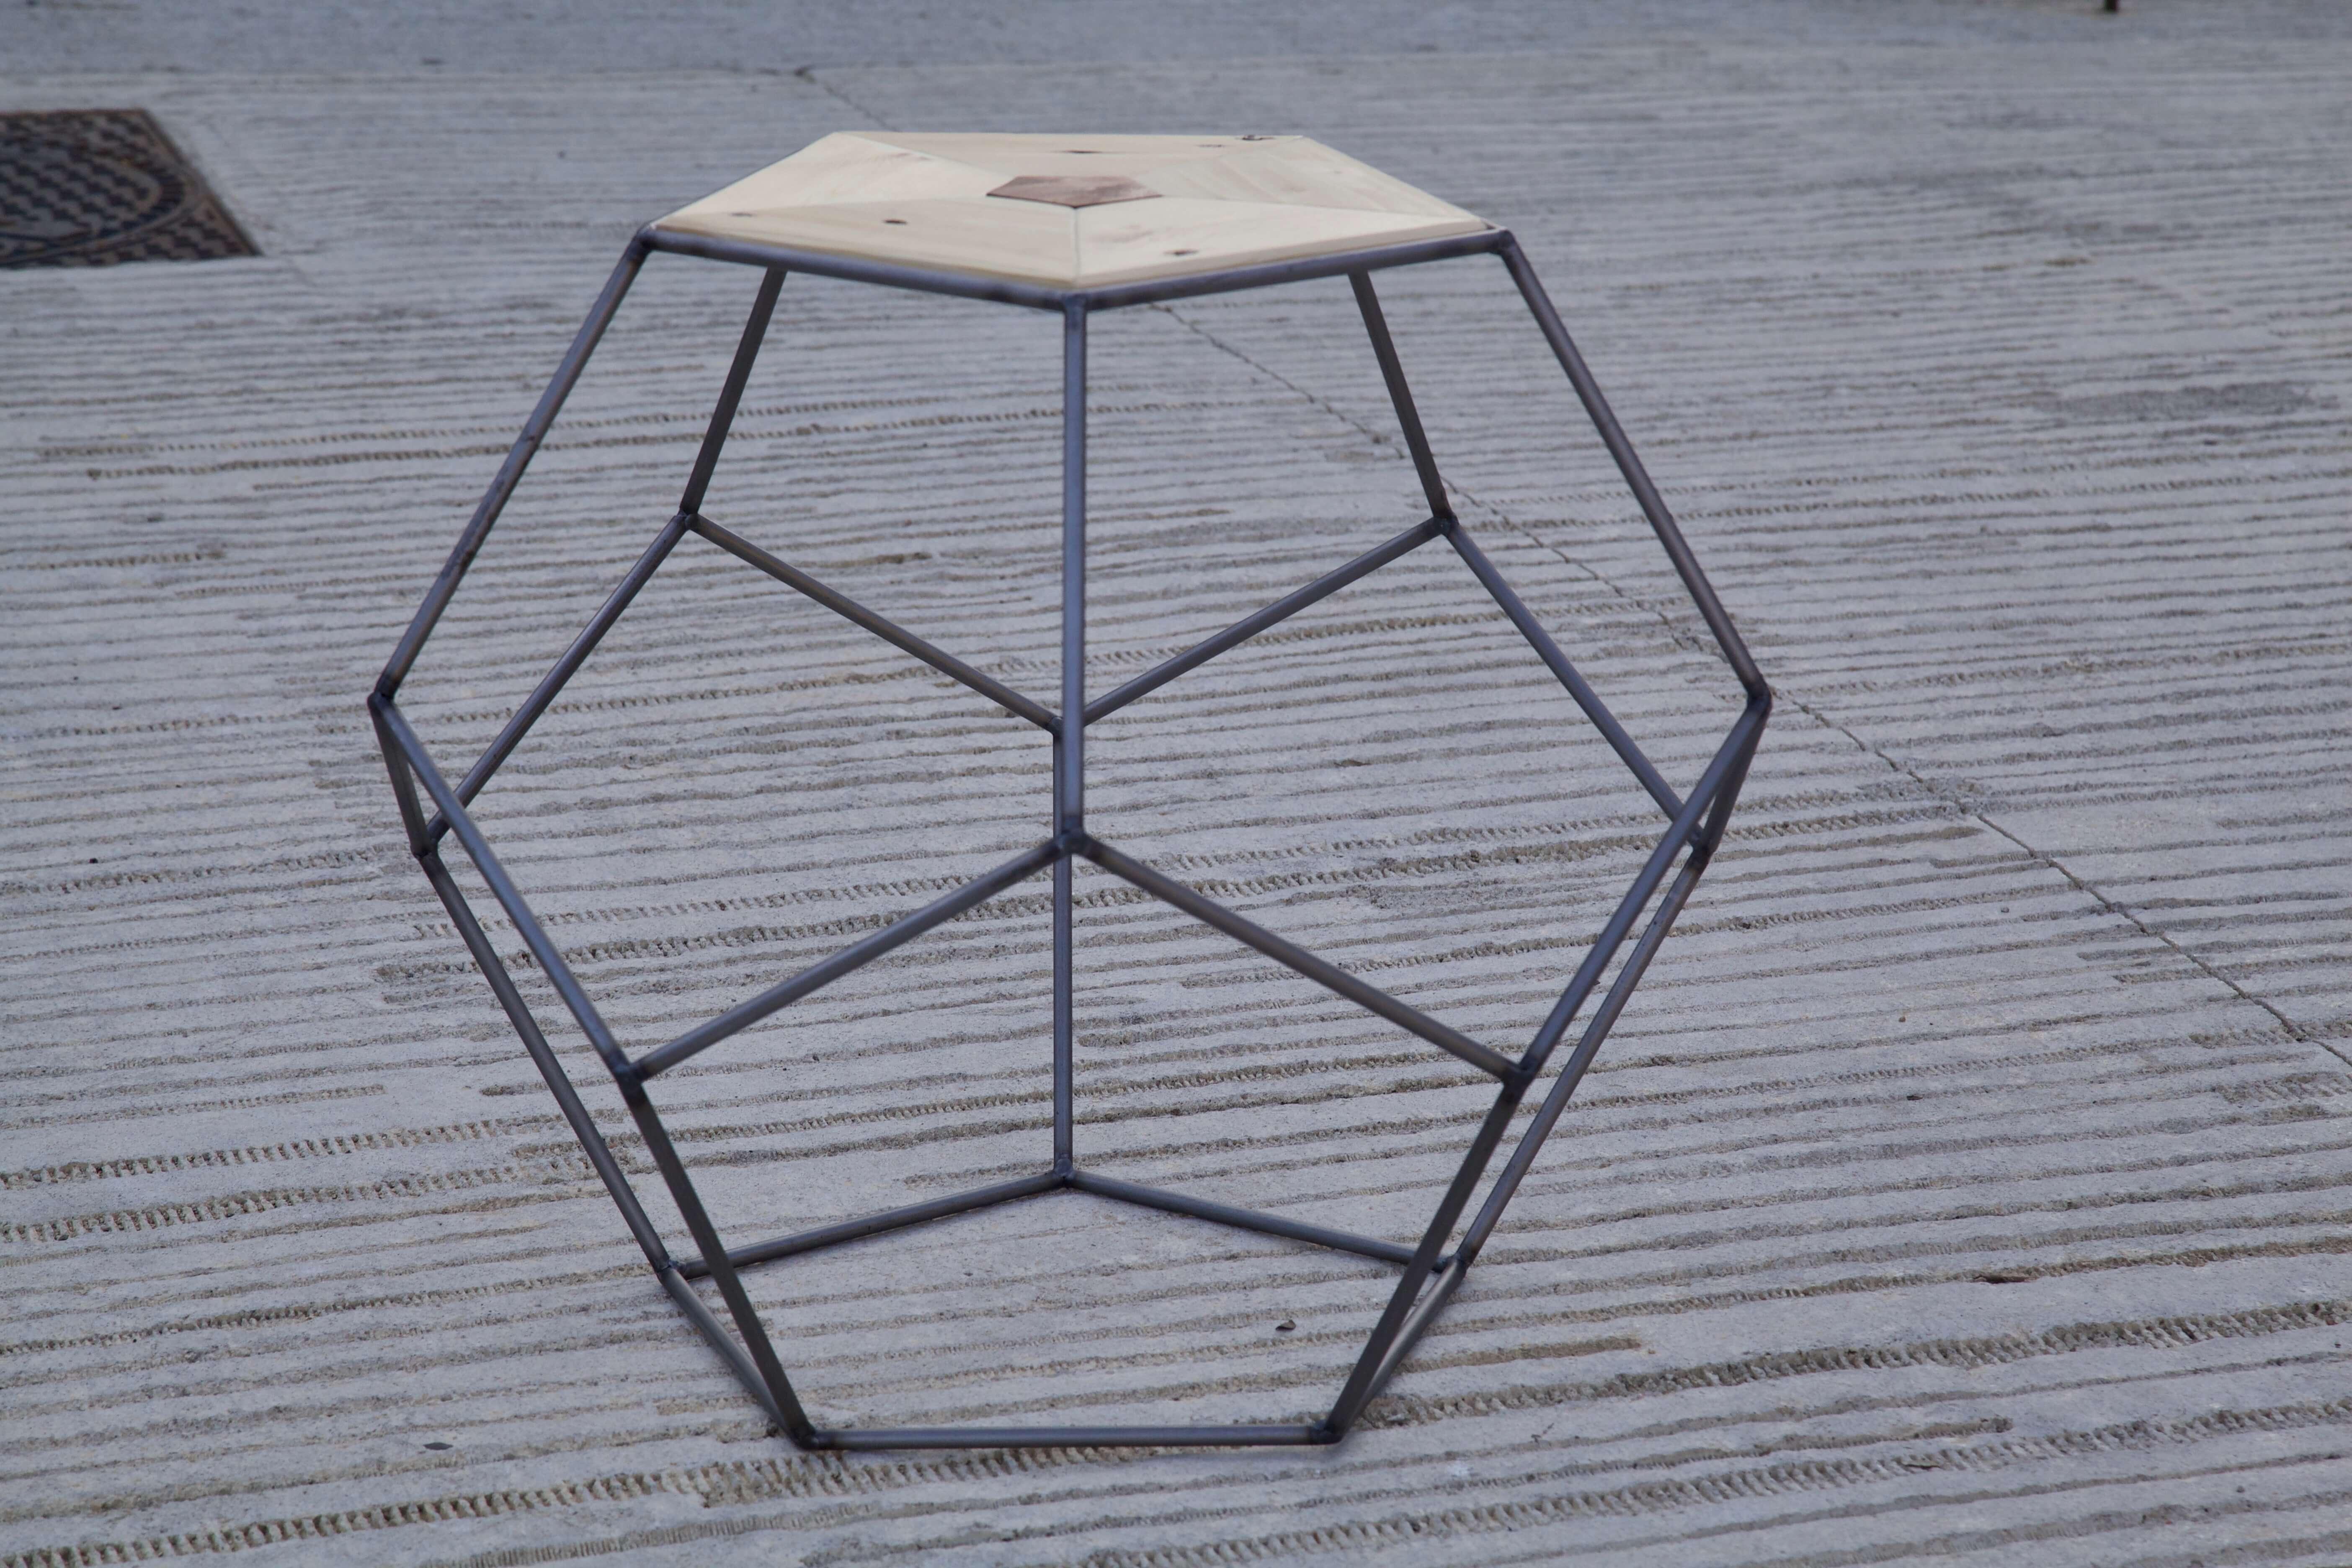 detalle lateral horizontal de la mesa pentagonal hecha con palets